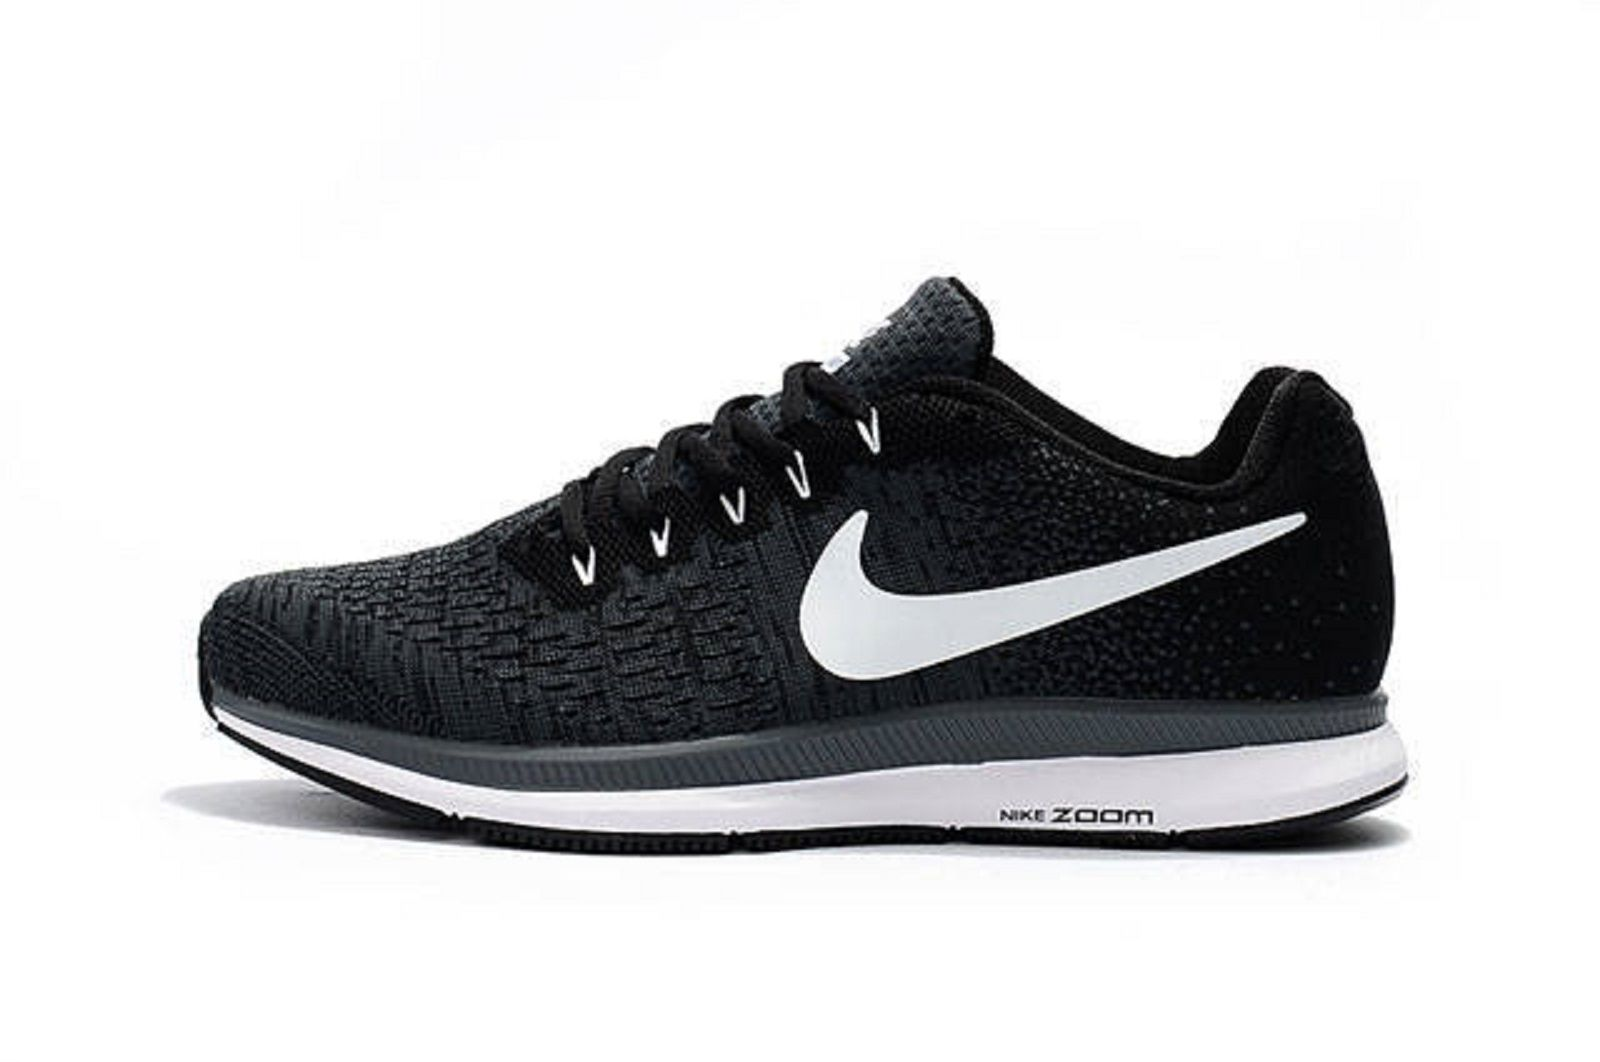 Nike Air Zoom Pegasus 33 Knite Gray Running Shoes